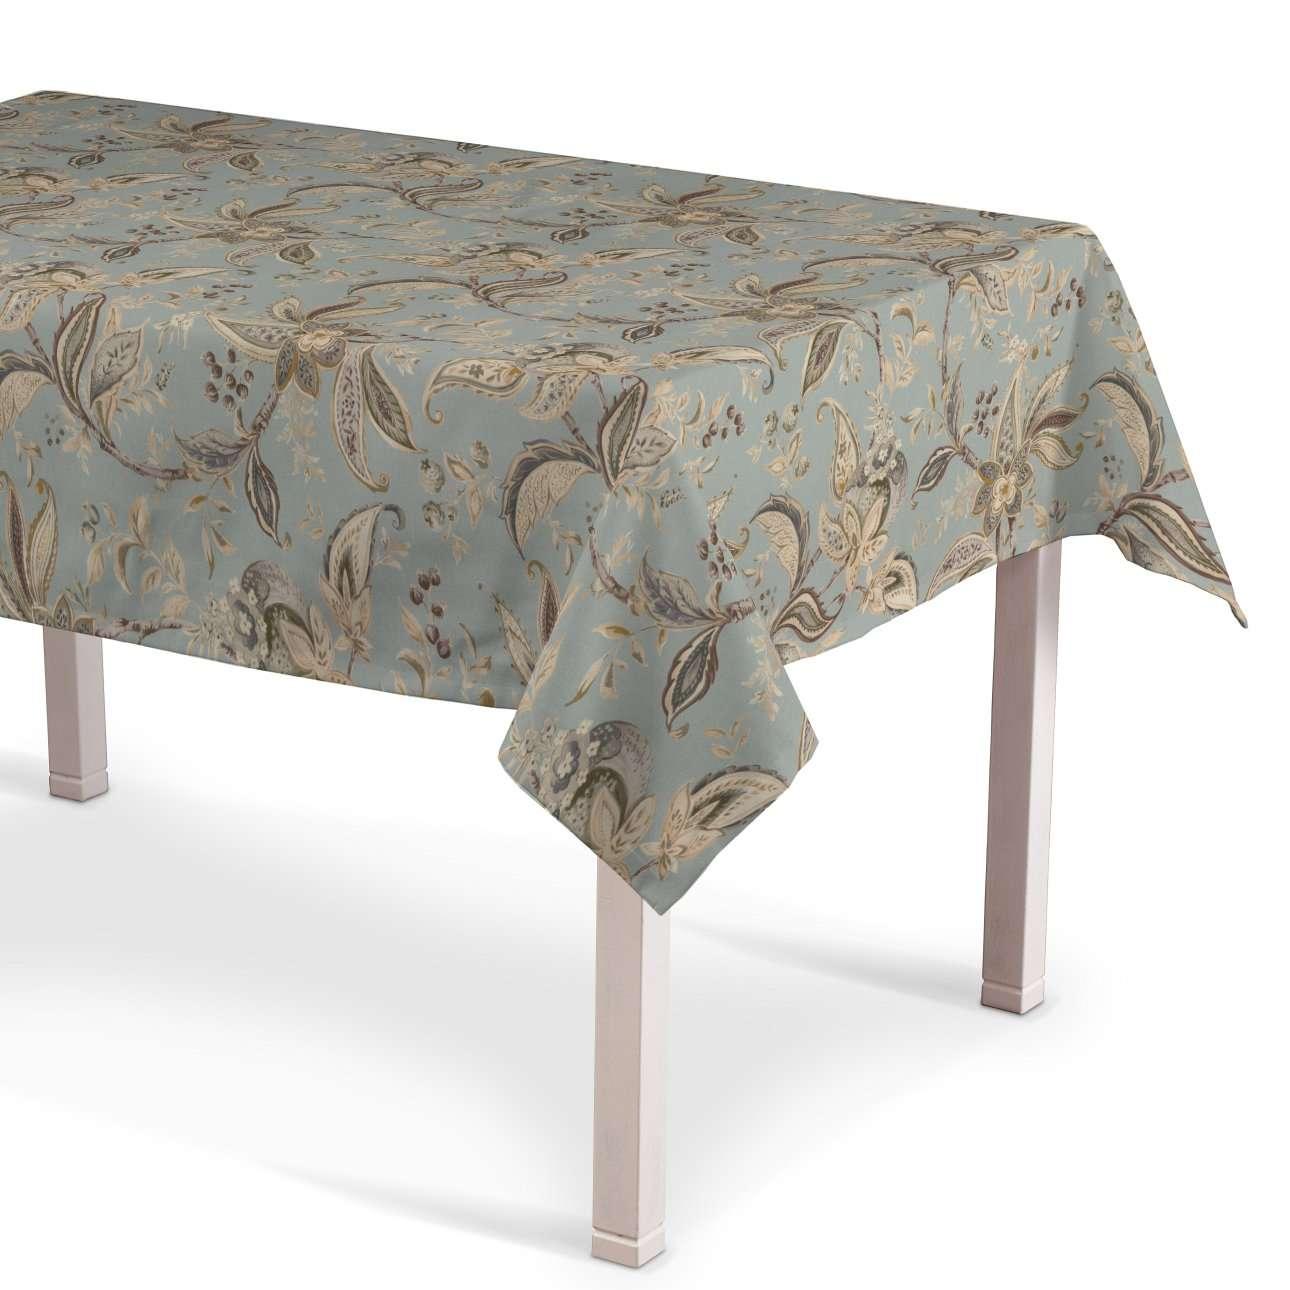 Rectangular tablecloth in collection Gardenia, fabric: 142-18